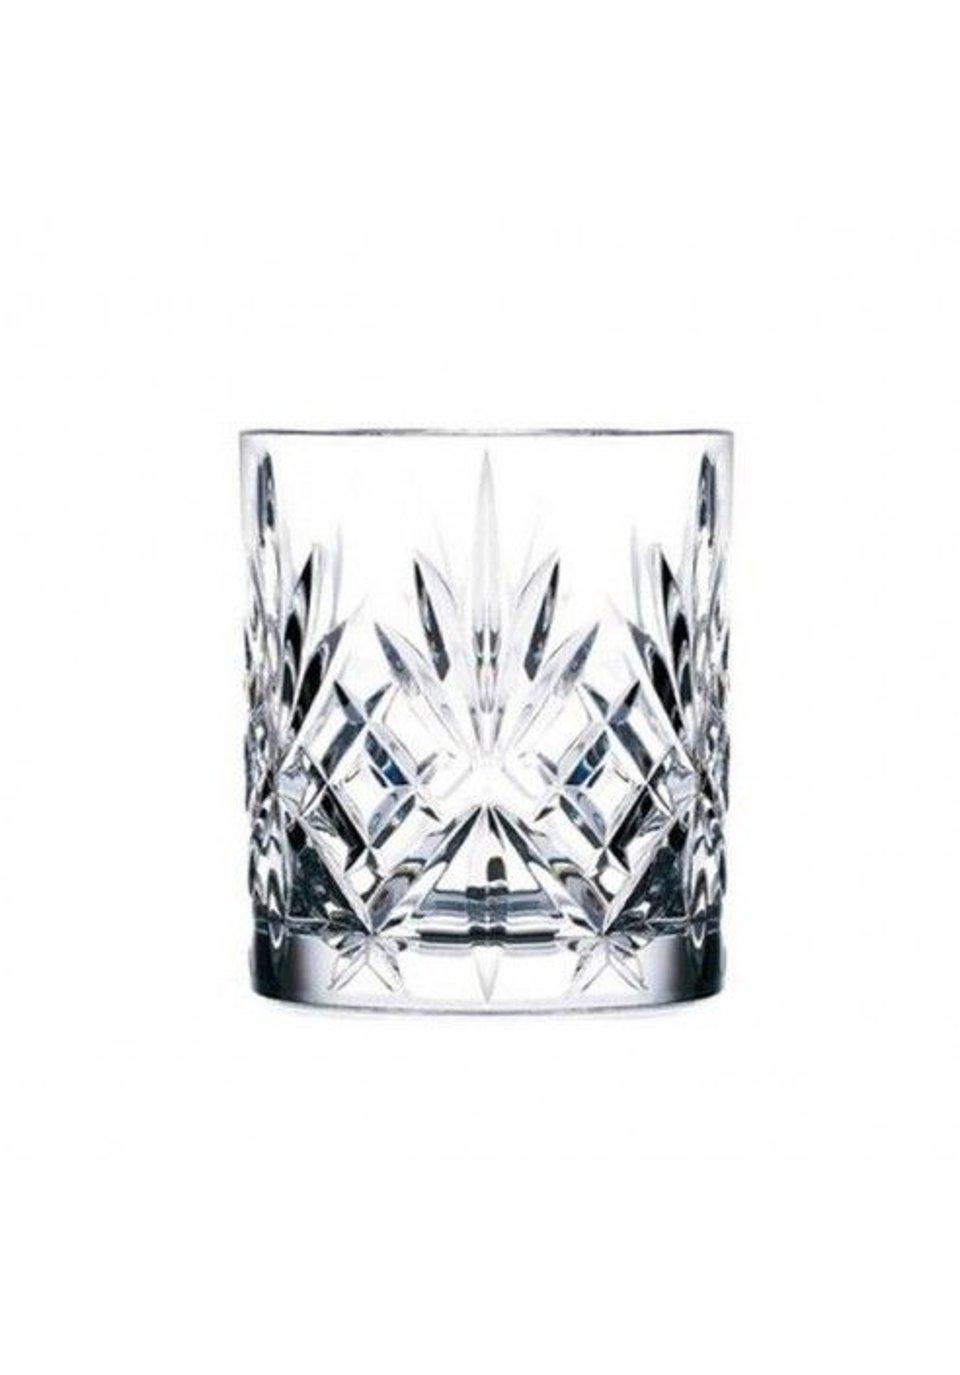 RCR Melodia 310ml - Glass - ONE